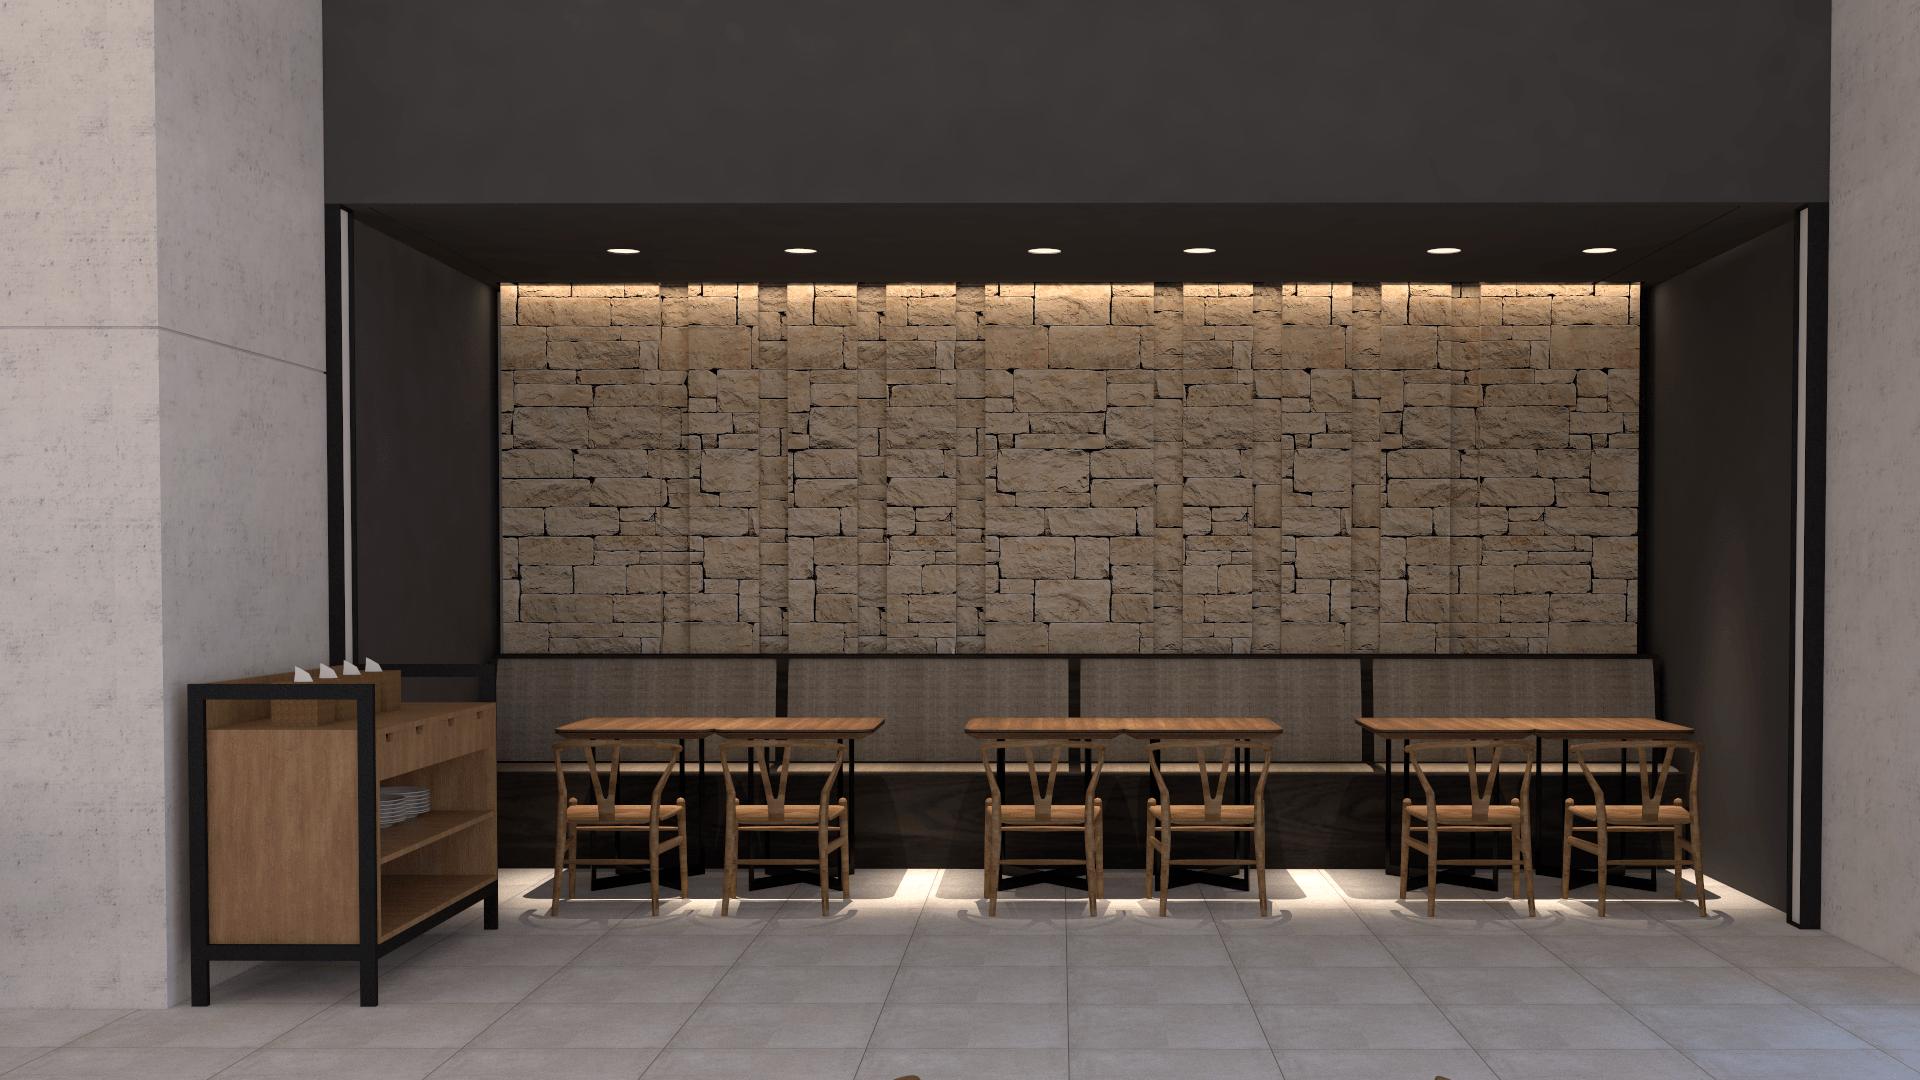 Aurava Architect Nirwana Restaurant Bogor, Jawa Barat, Indonesia Gn. Batu, Sukaharja, Sukamakmur, Bogor, Jawa Barat, Indonesia Aurava-Architect-Restaurant-At-Gunung-Batu   67035